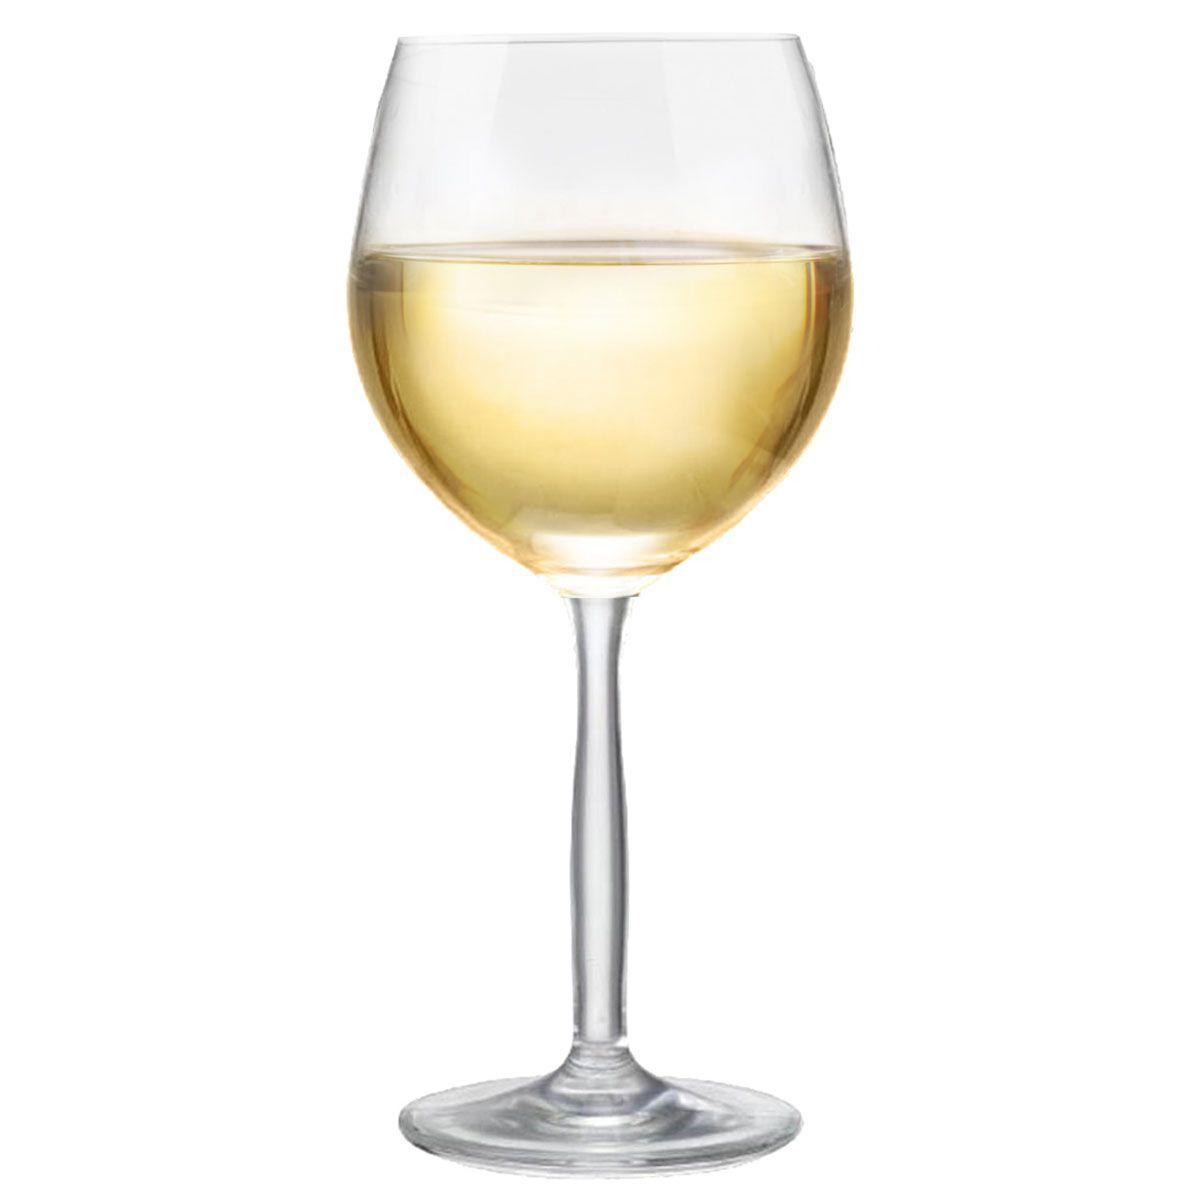 Taça Vinho - Crsital Branco Bordeaux 380ml C/ 6 Unid